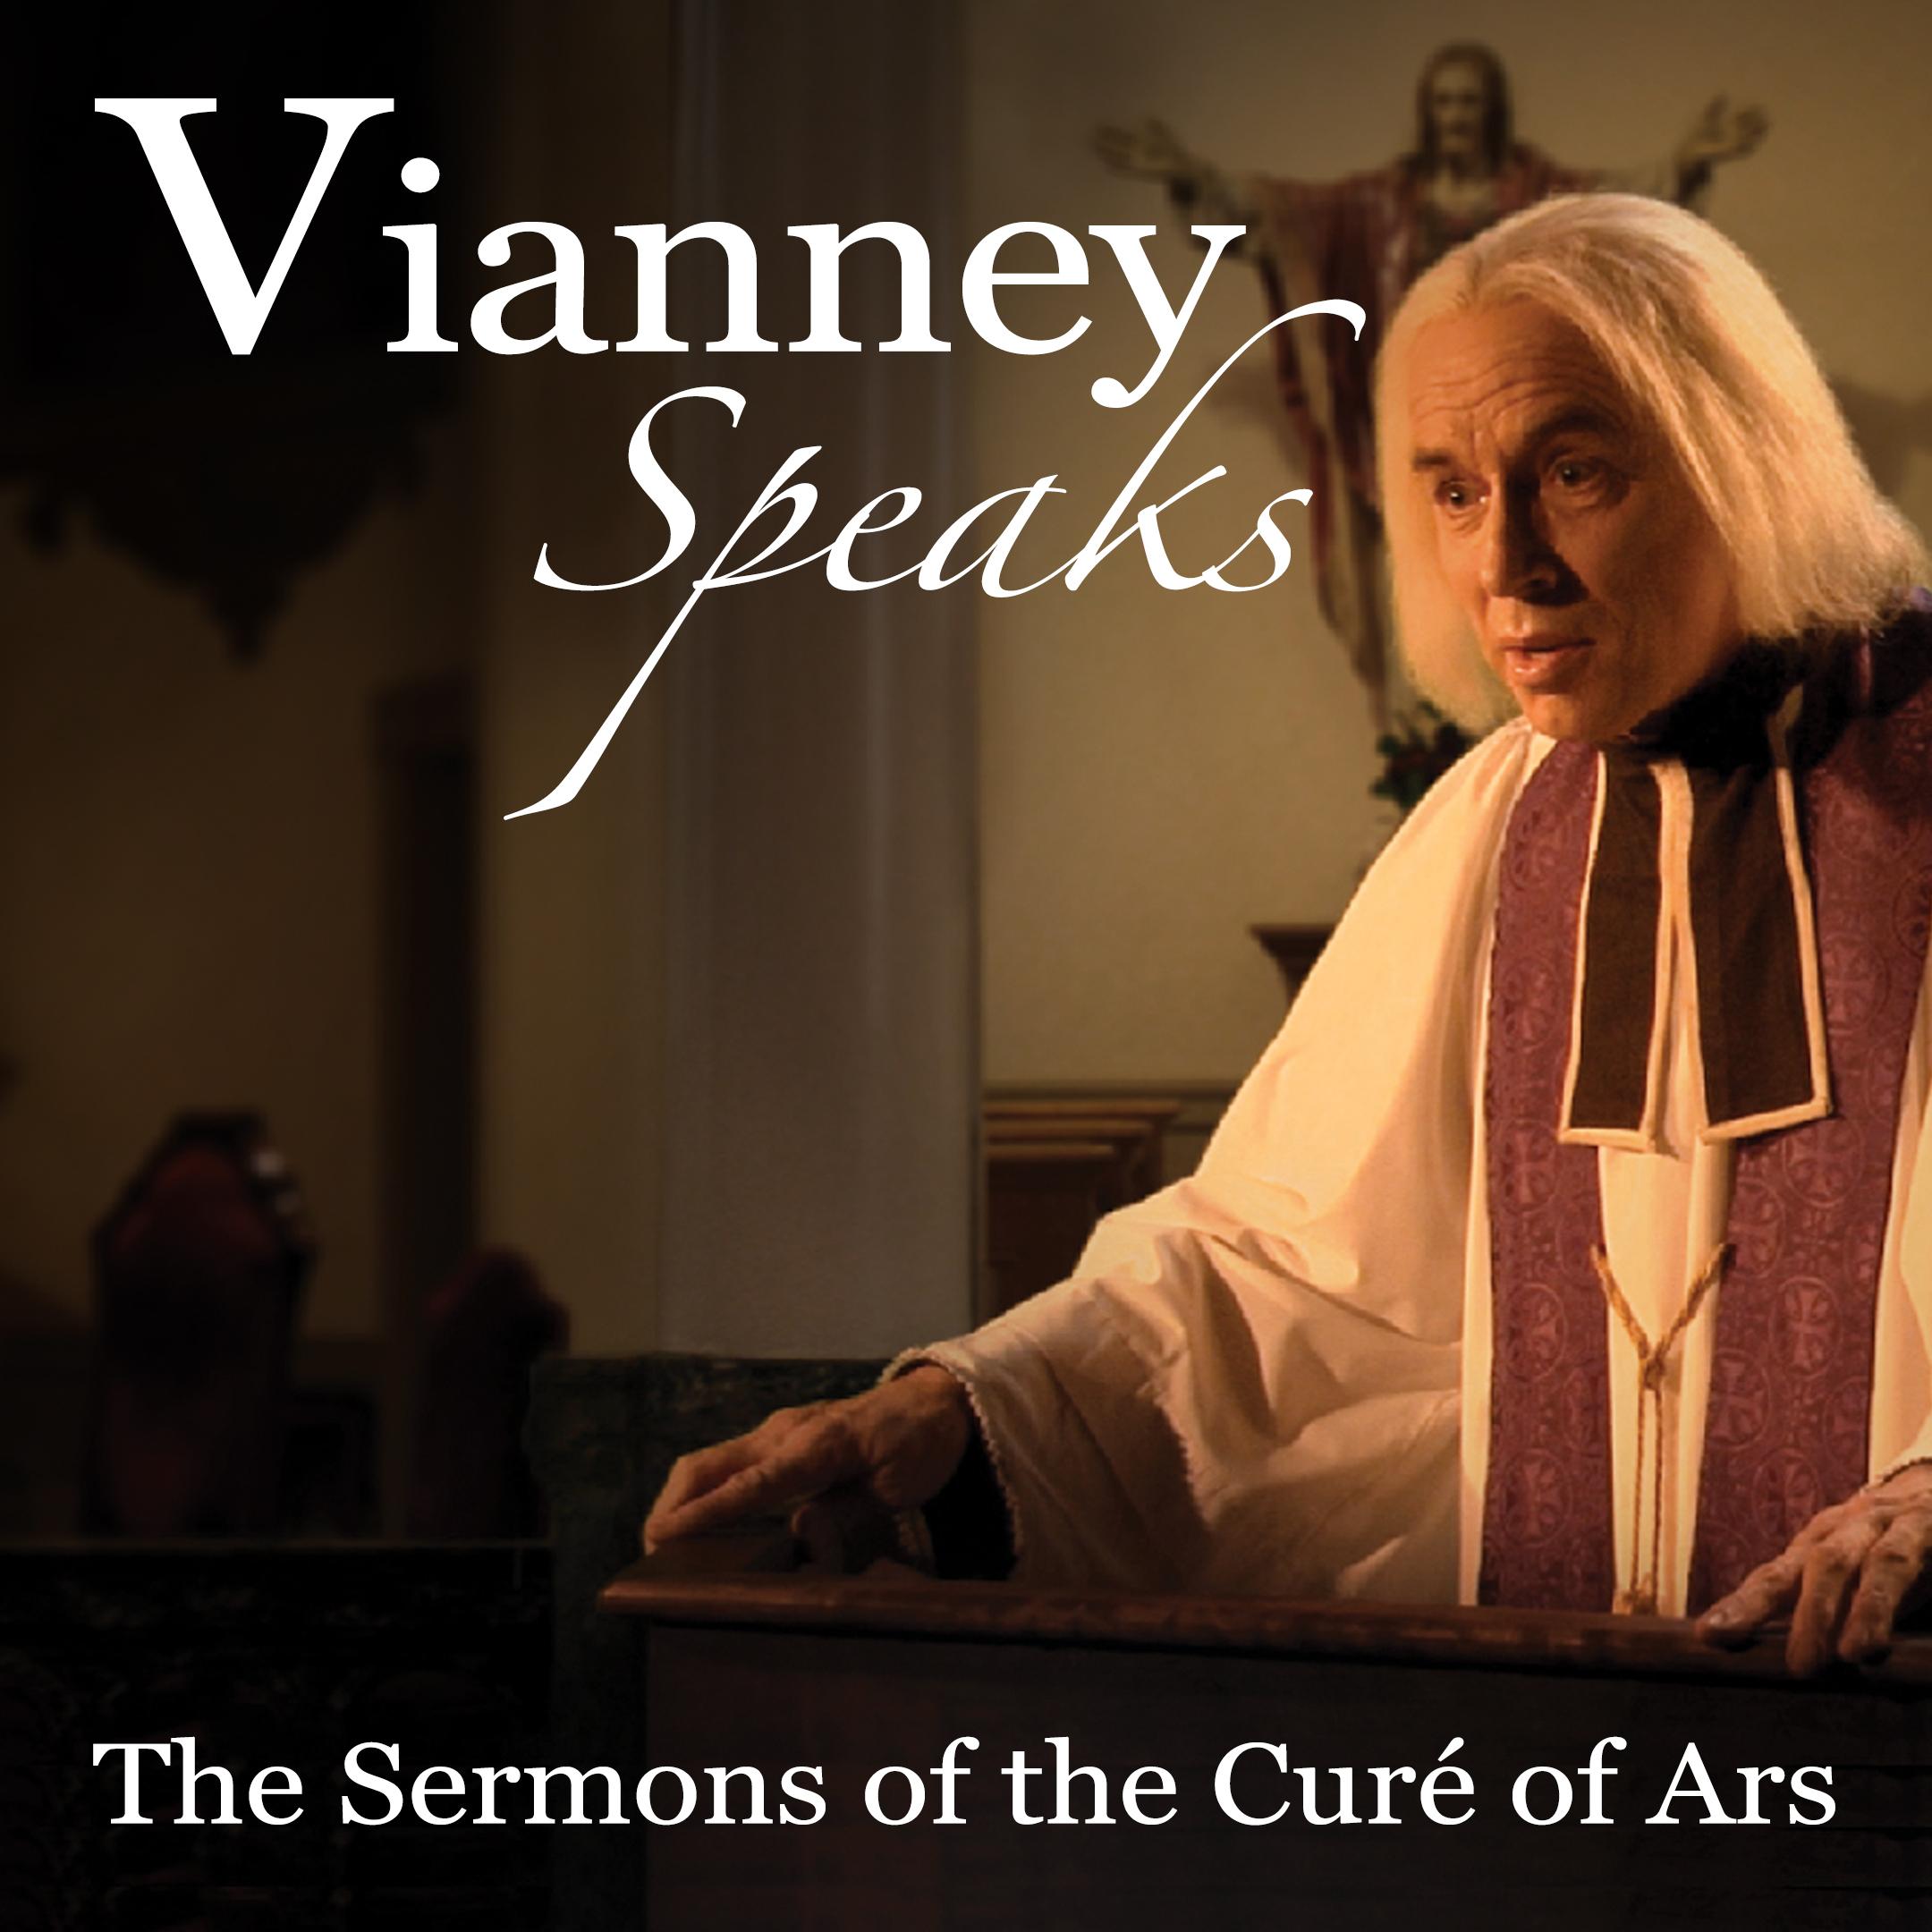 Vianney Speaks MP3 Download